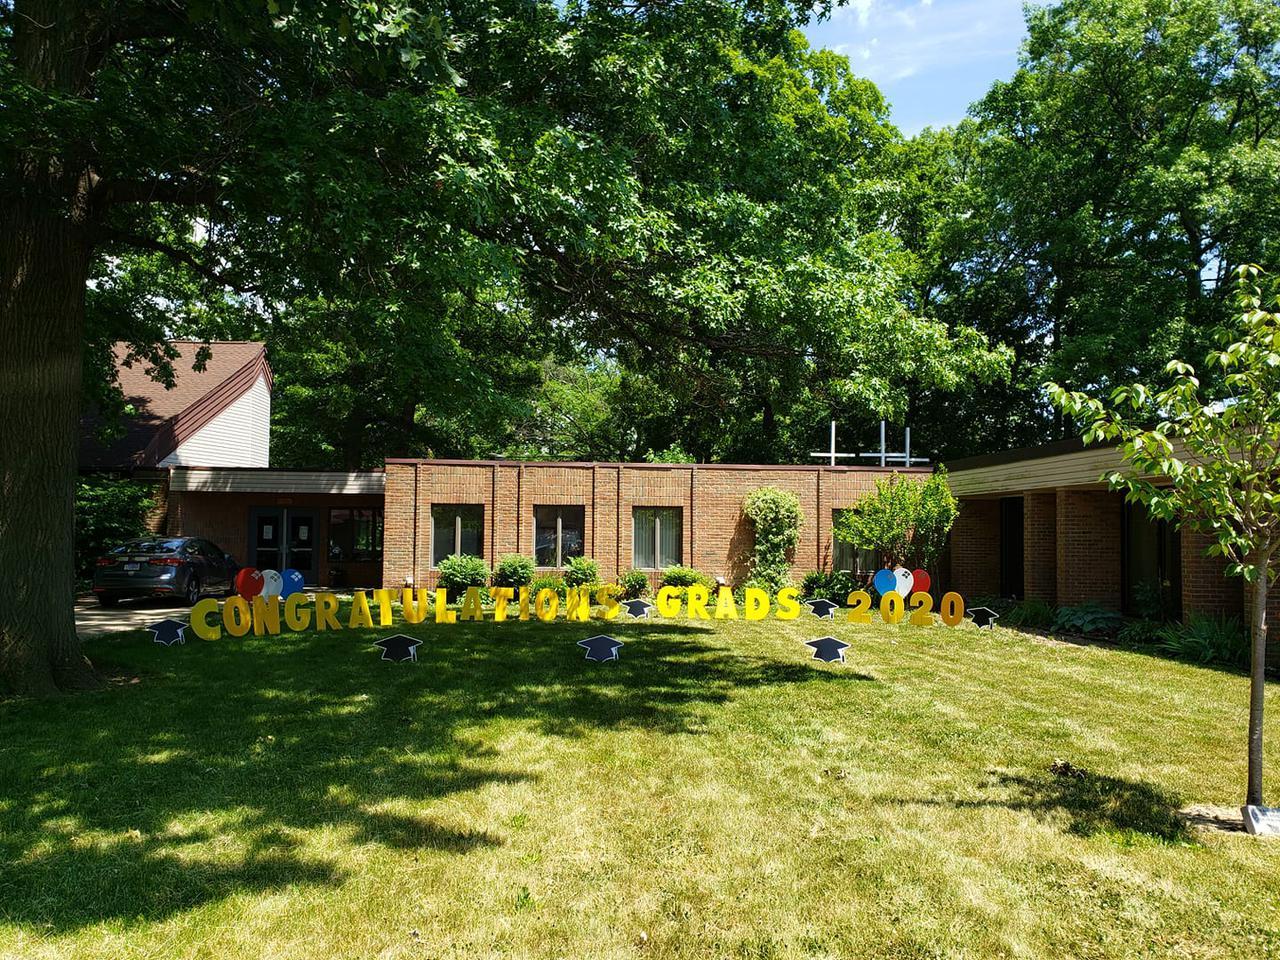 congrats grad custom yard sign decoration